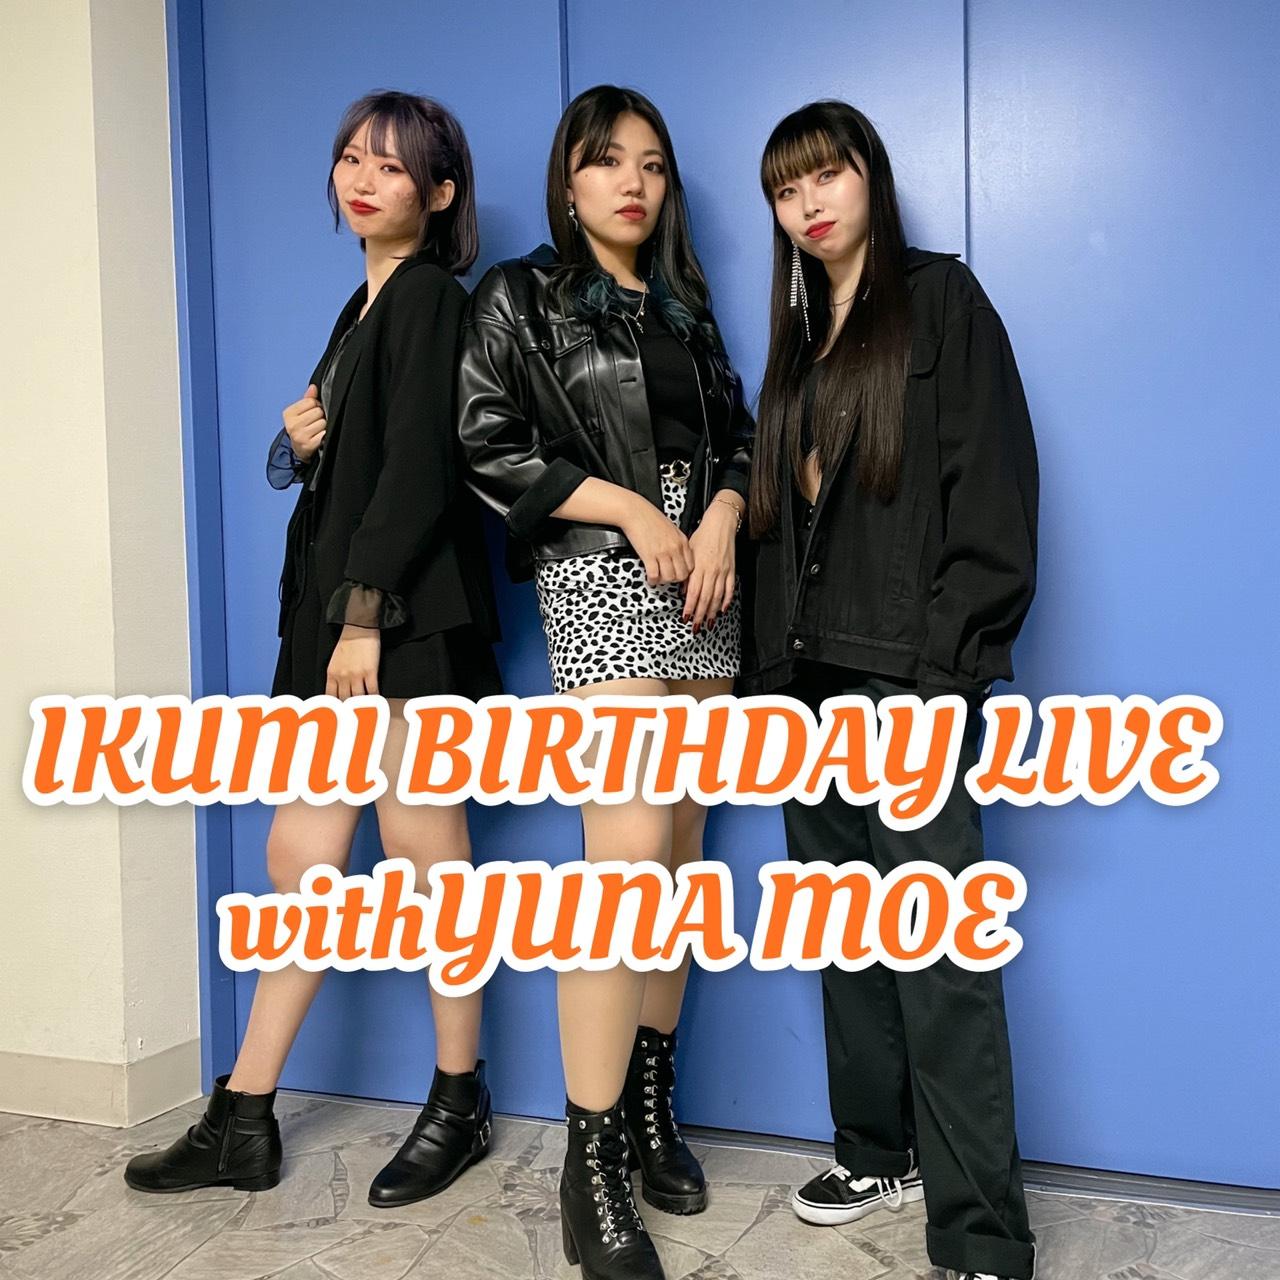 IKUMI BIRTHDAY LIVE withYUNA MOE